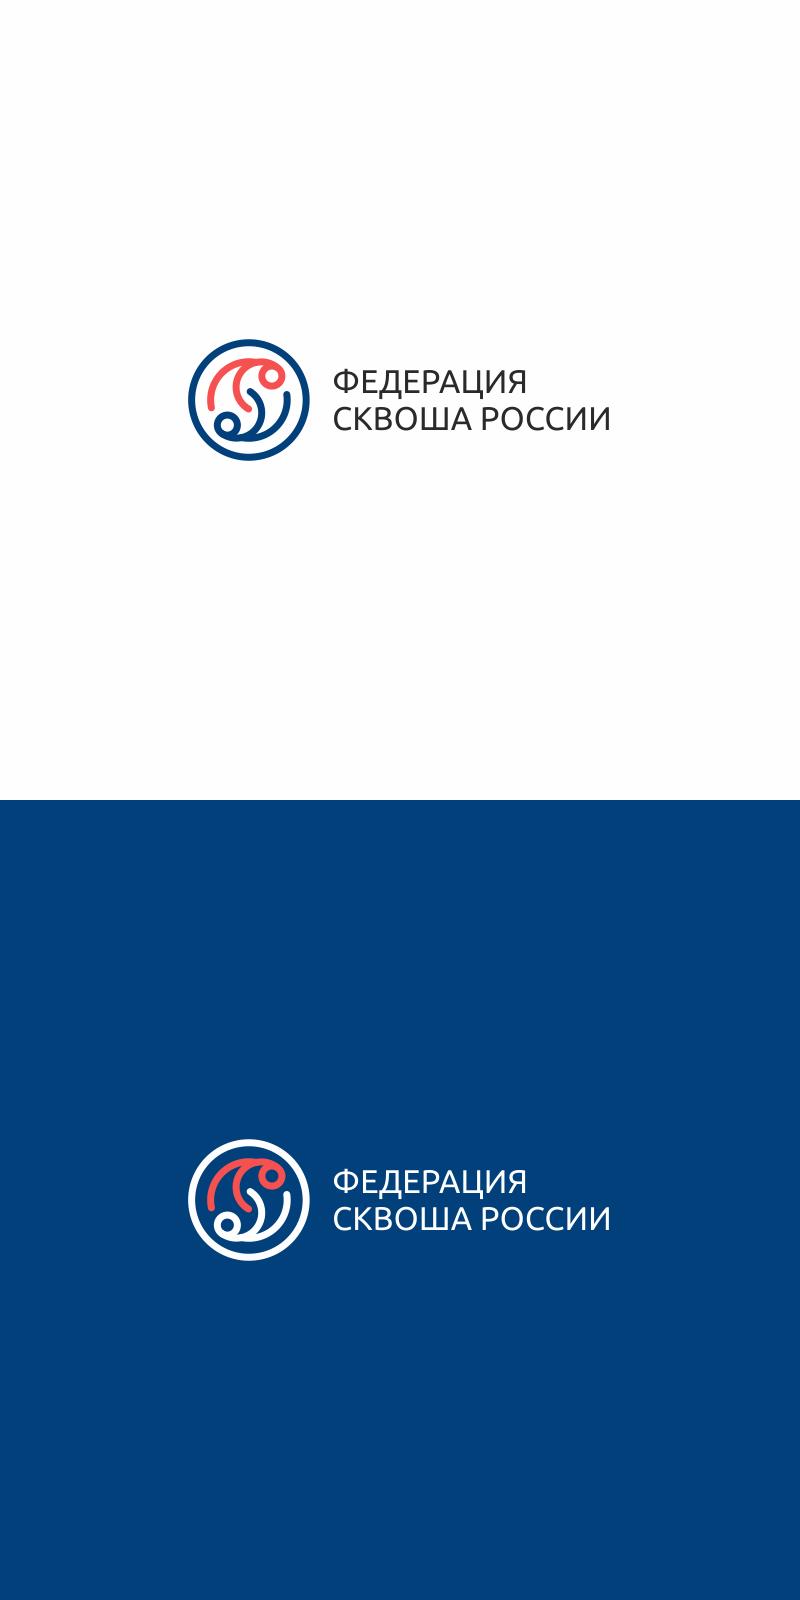 Разработать логотип для Федерации сквоша России фото f_1285f396f8bb2ce7.png